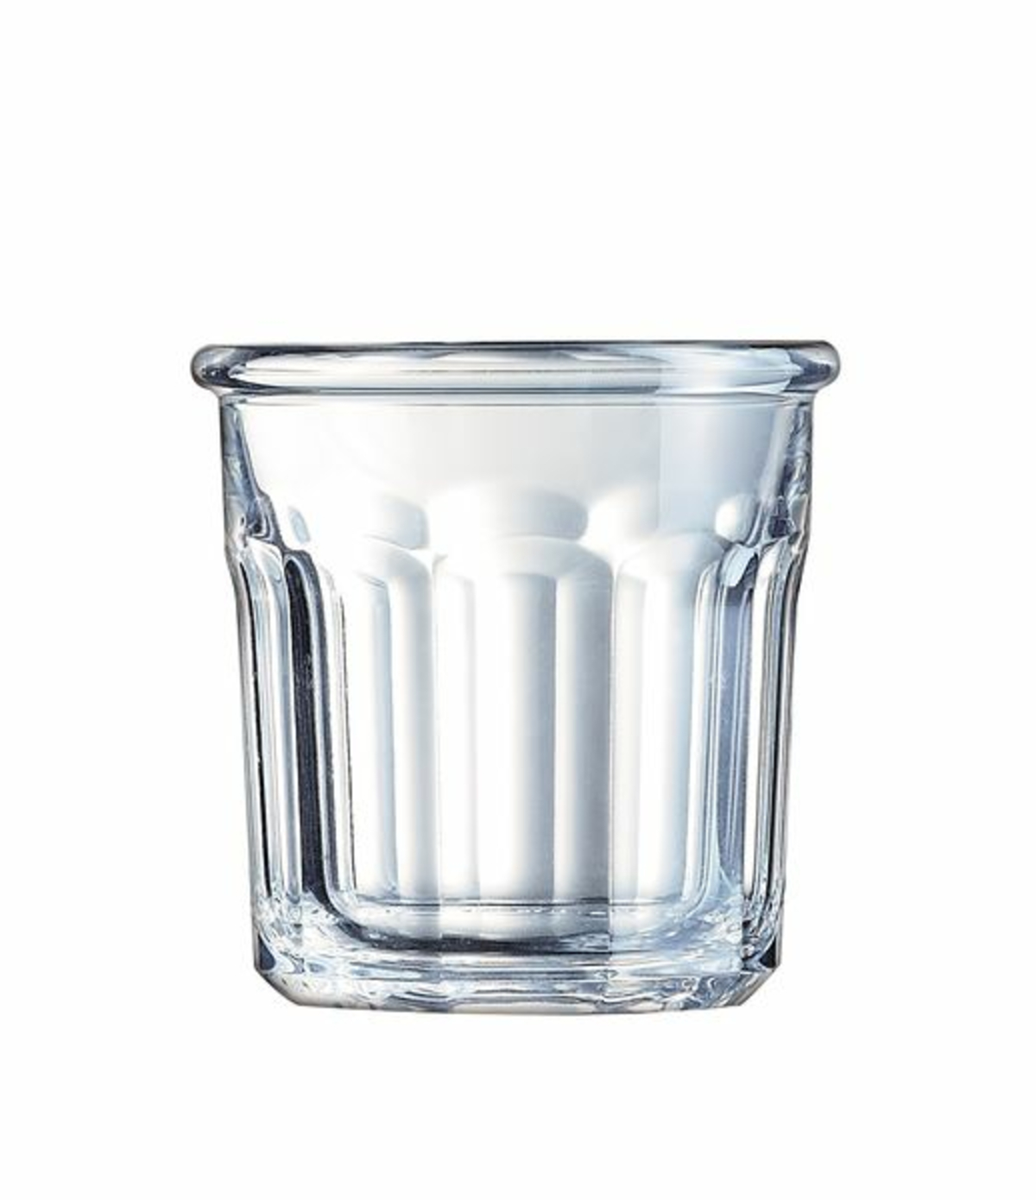 Verrine ronde transparente verre 9 cl Ø 6,20 cm Eskale Arcoroc